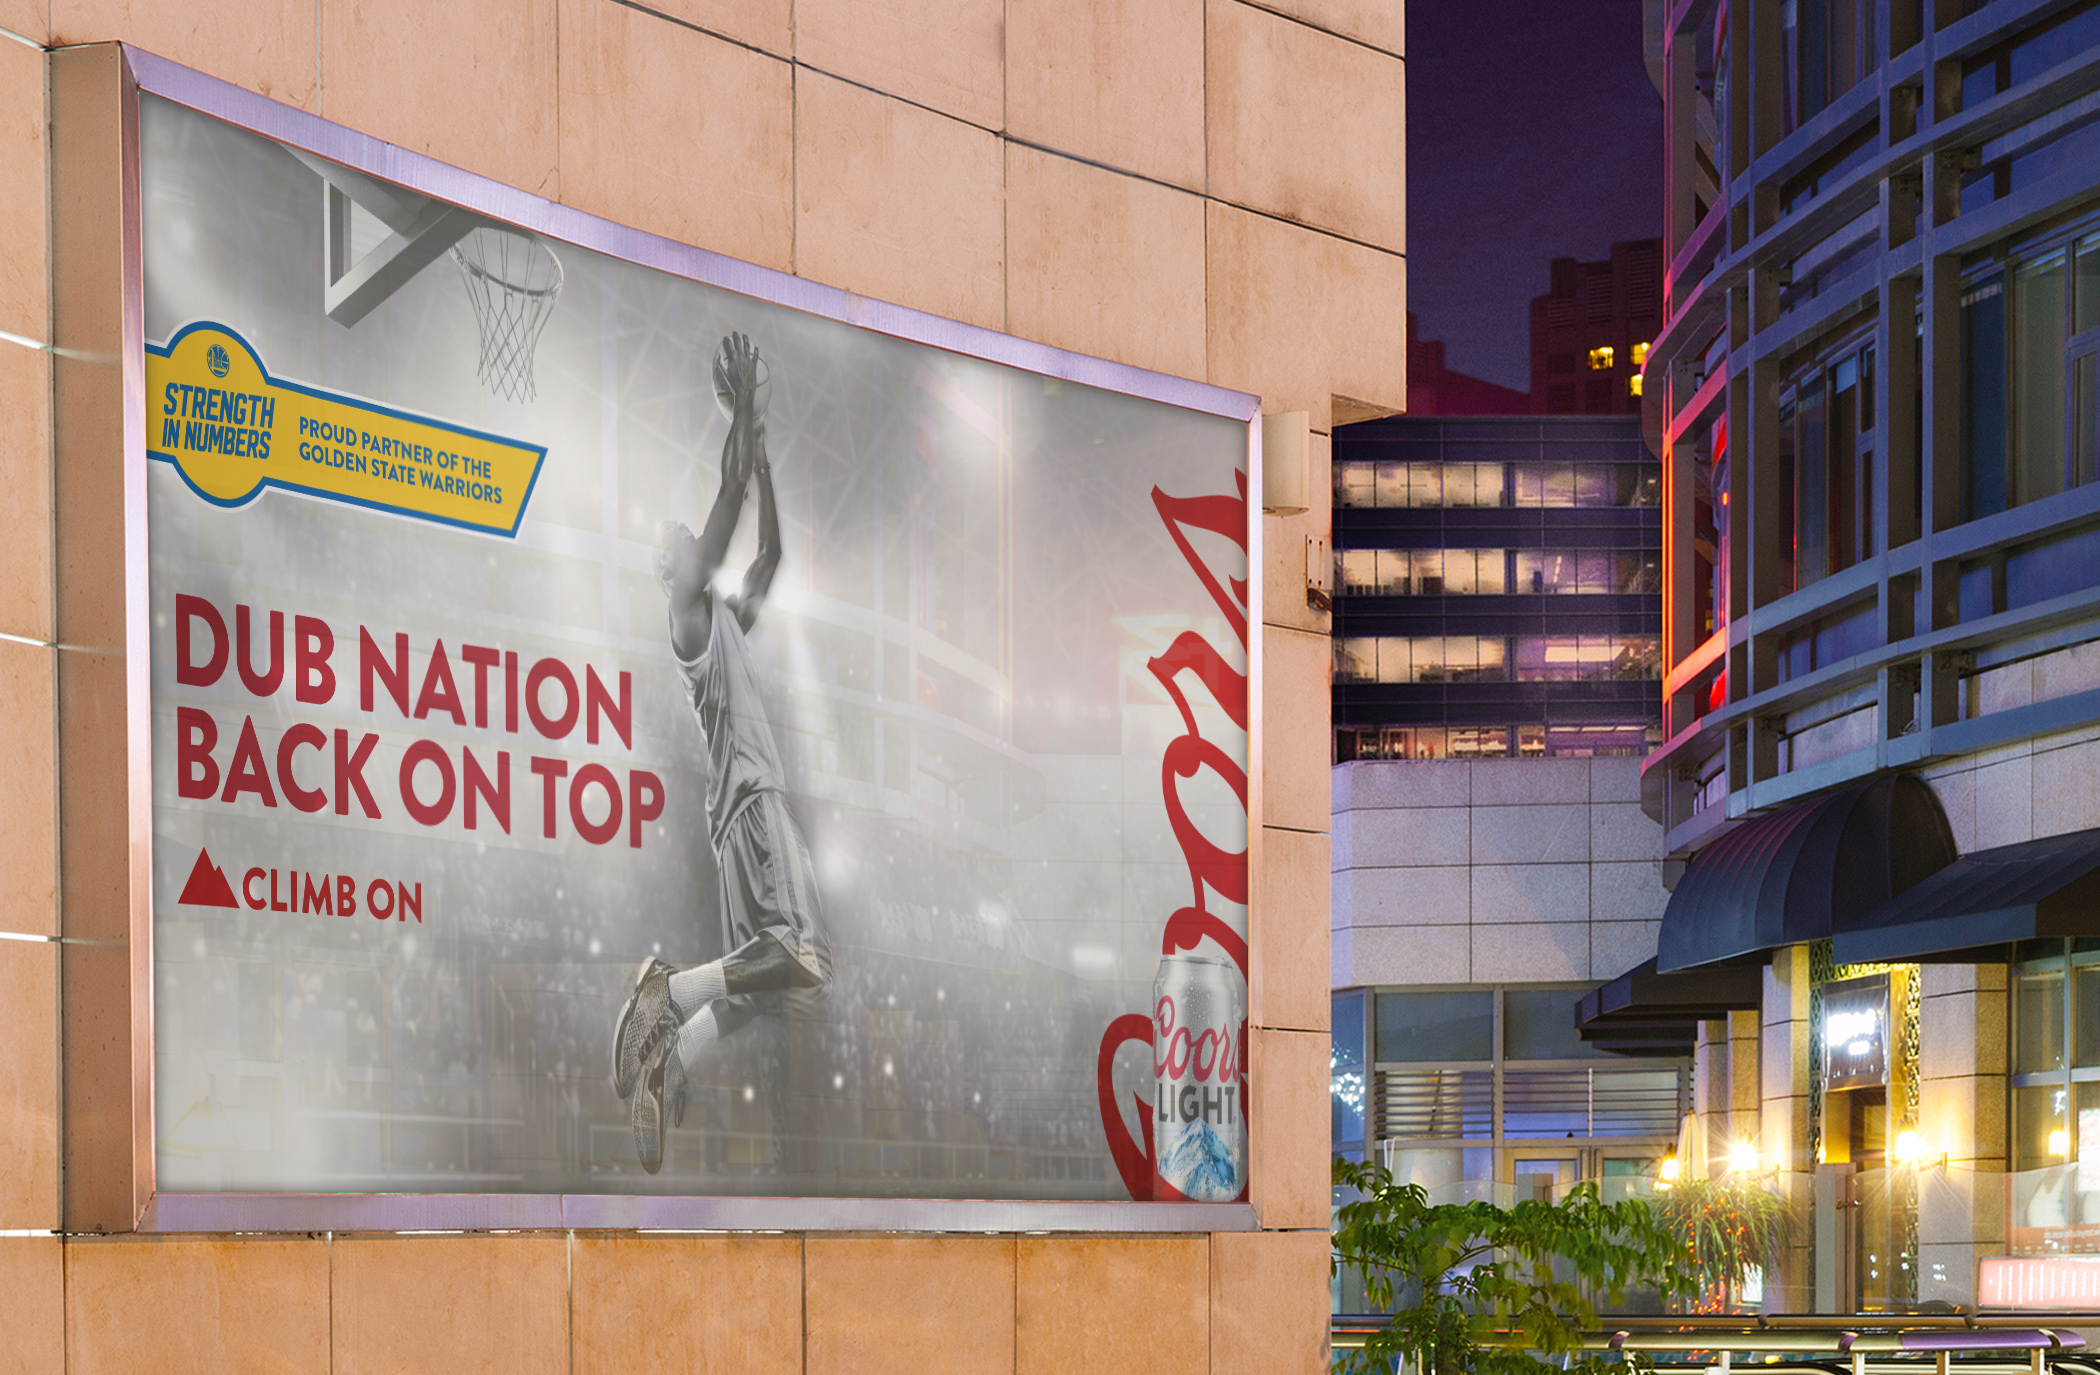 CL_dub-nation_banner-stadium.jpg